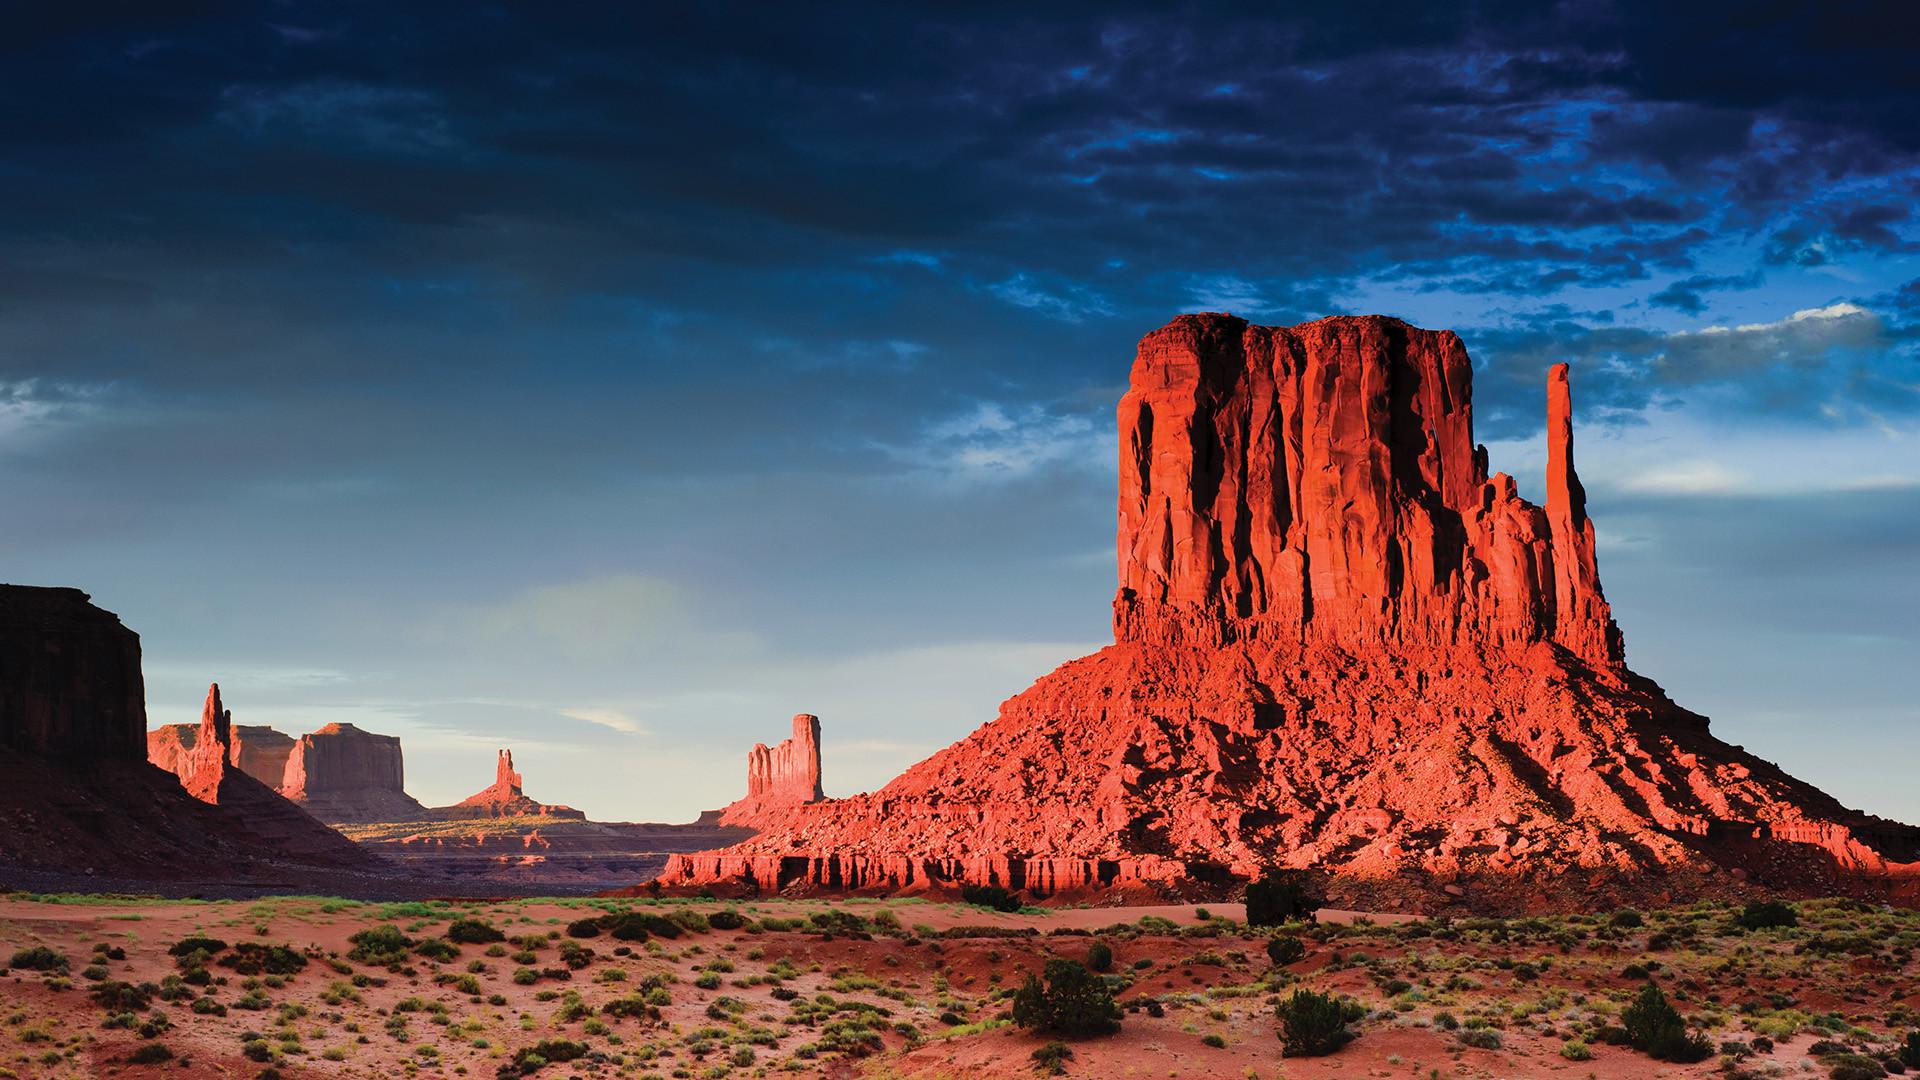 arizona desert wallpaper hd 40 images. Black Bedroom Furniture Sets. Home Design Ideas